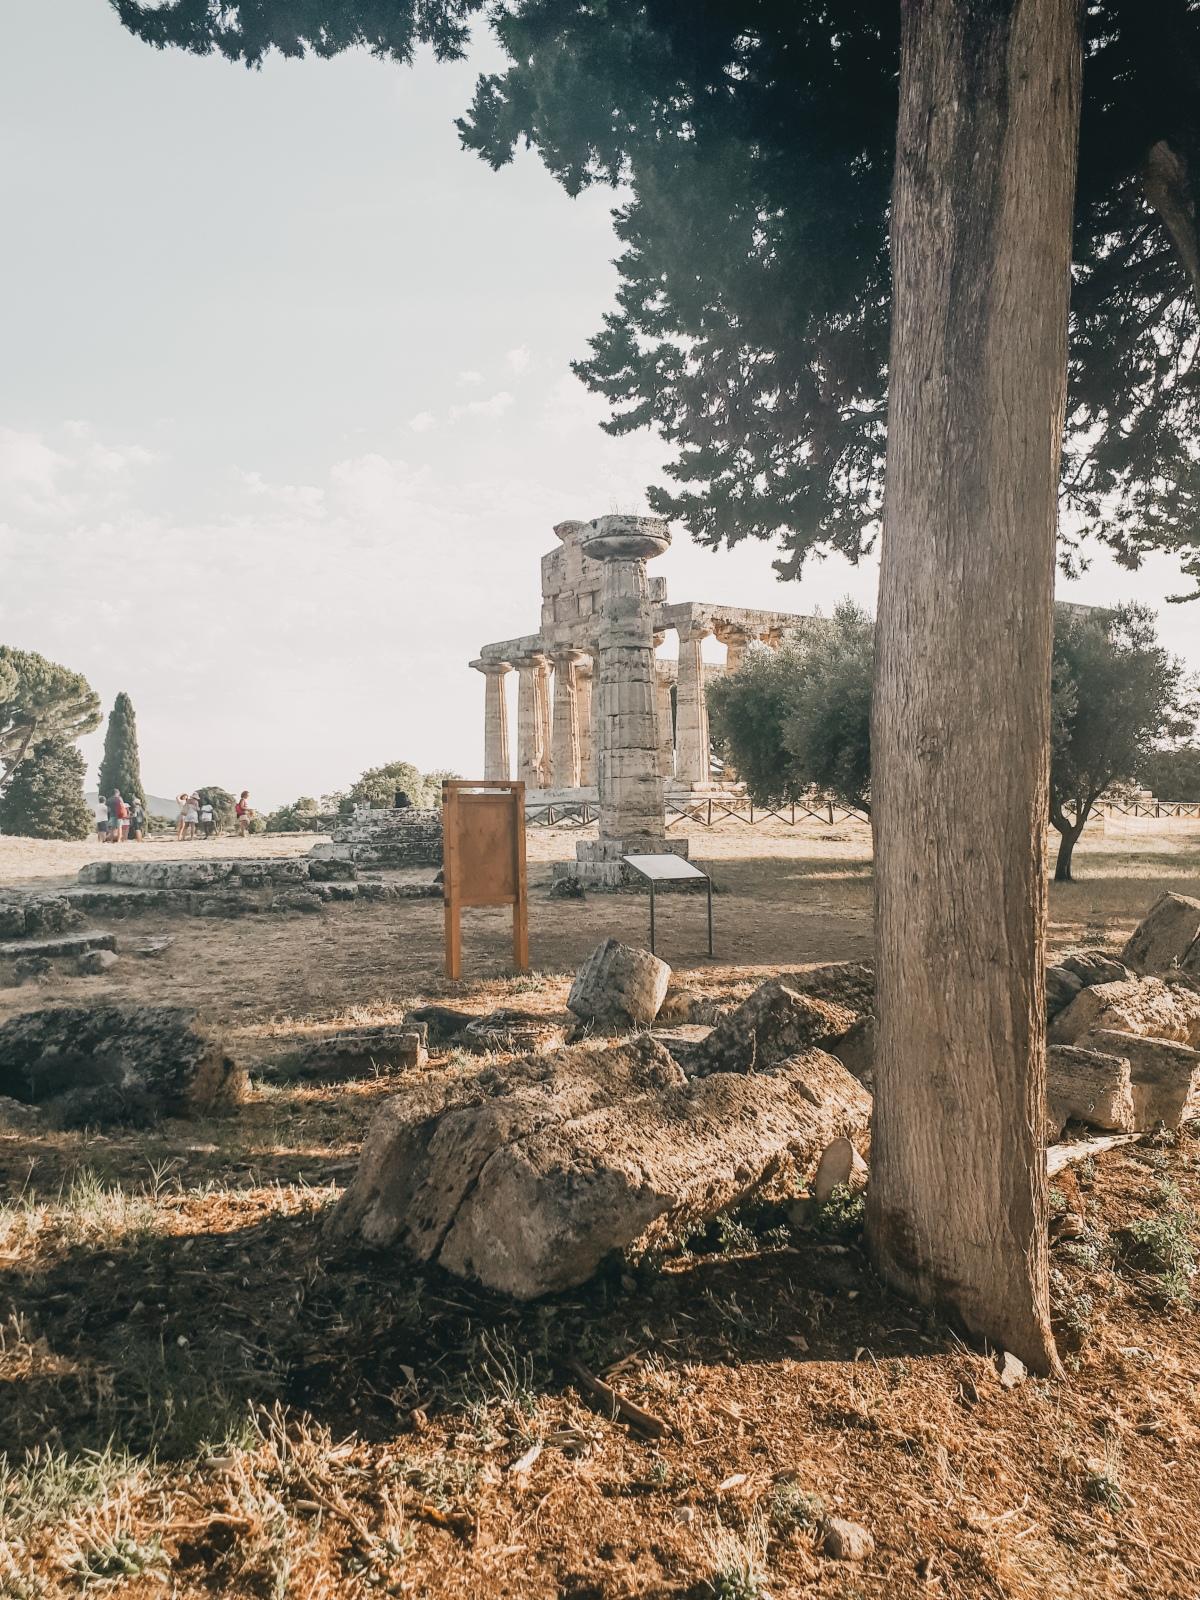 Parco archeologico Paestum, viaggio neltempo